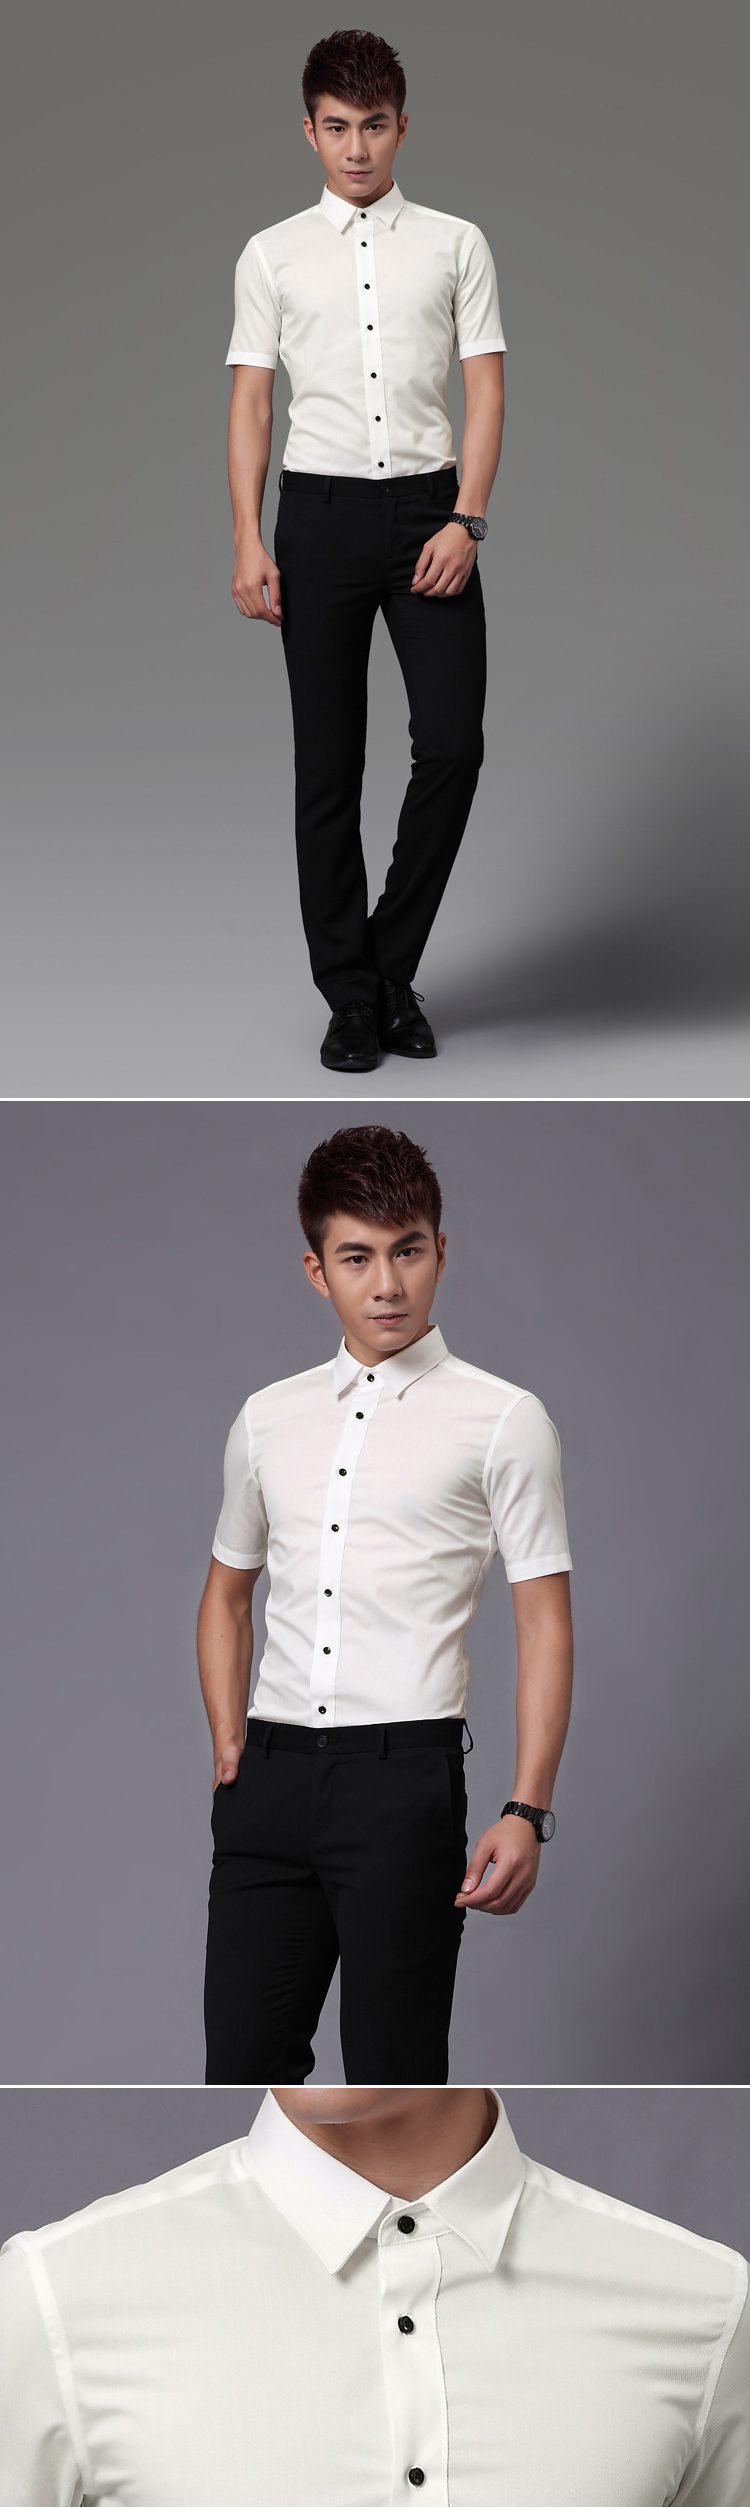 Ao so mi tron tay ngan Trang ASM533